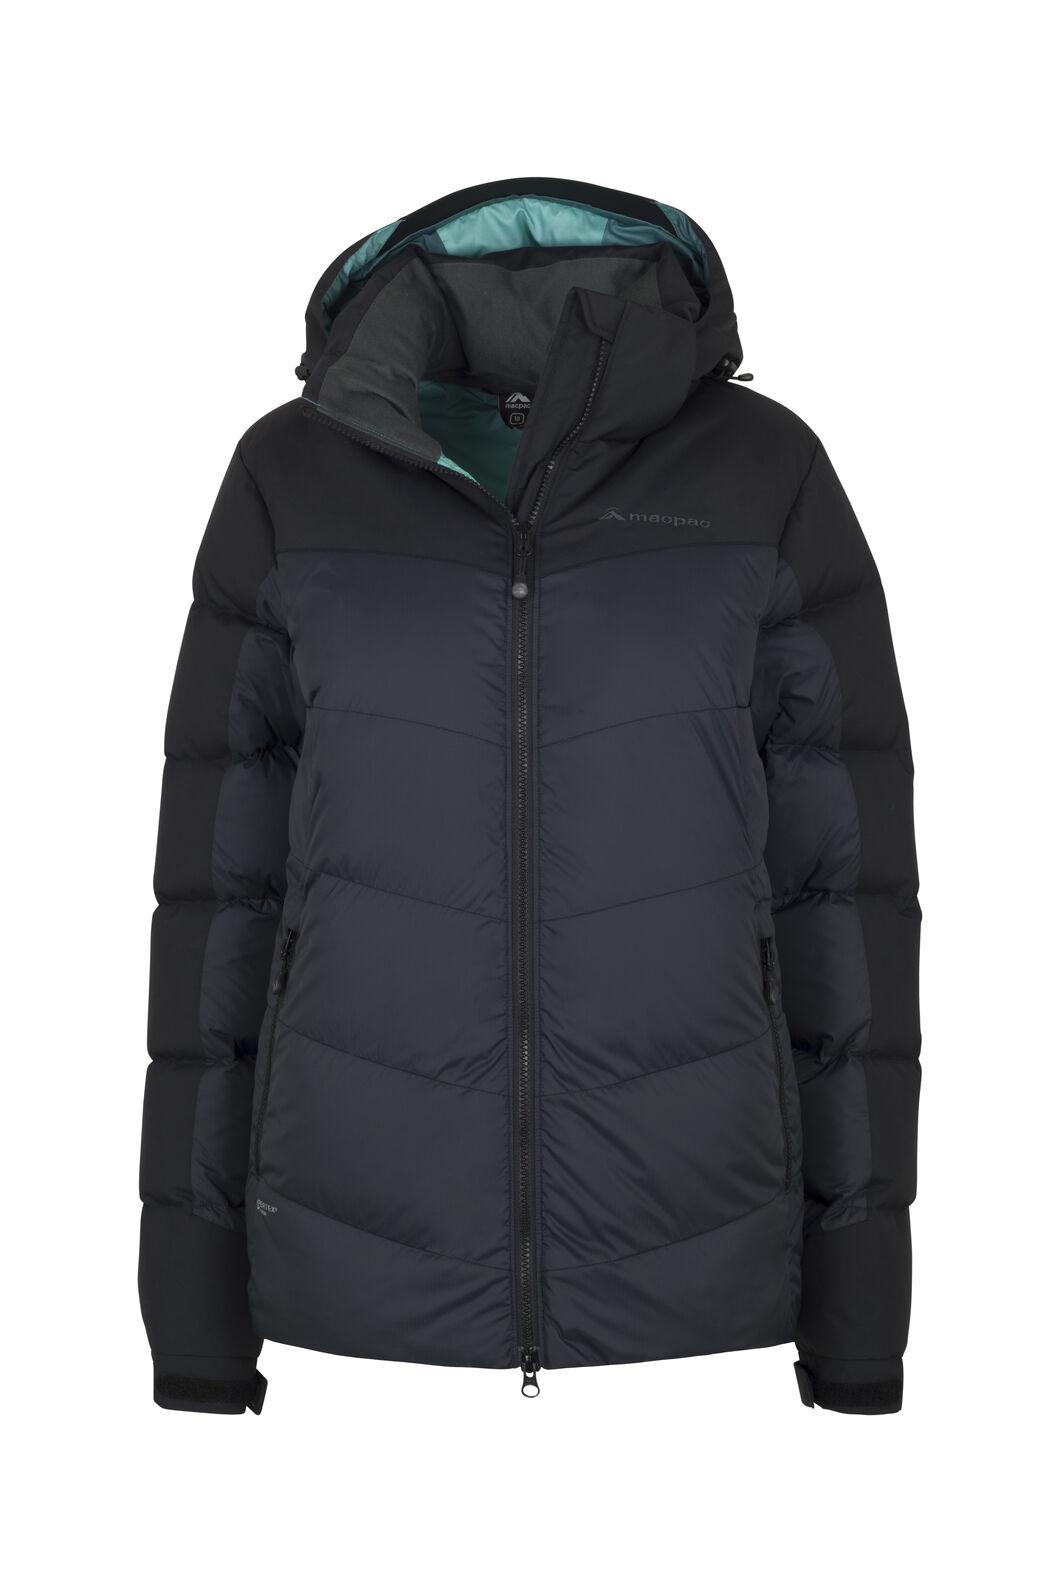 Macpac Ember Jacket - Women's, Black, hi-res